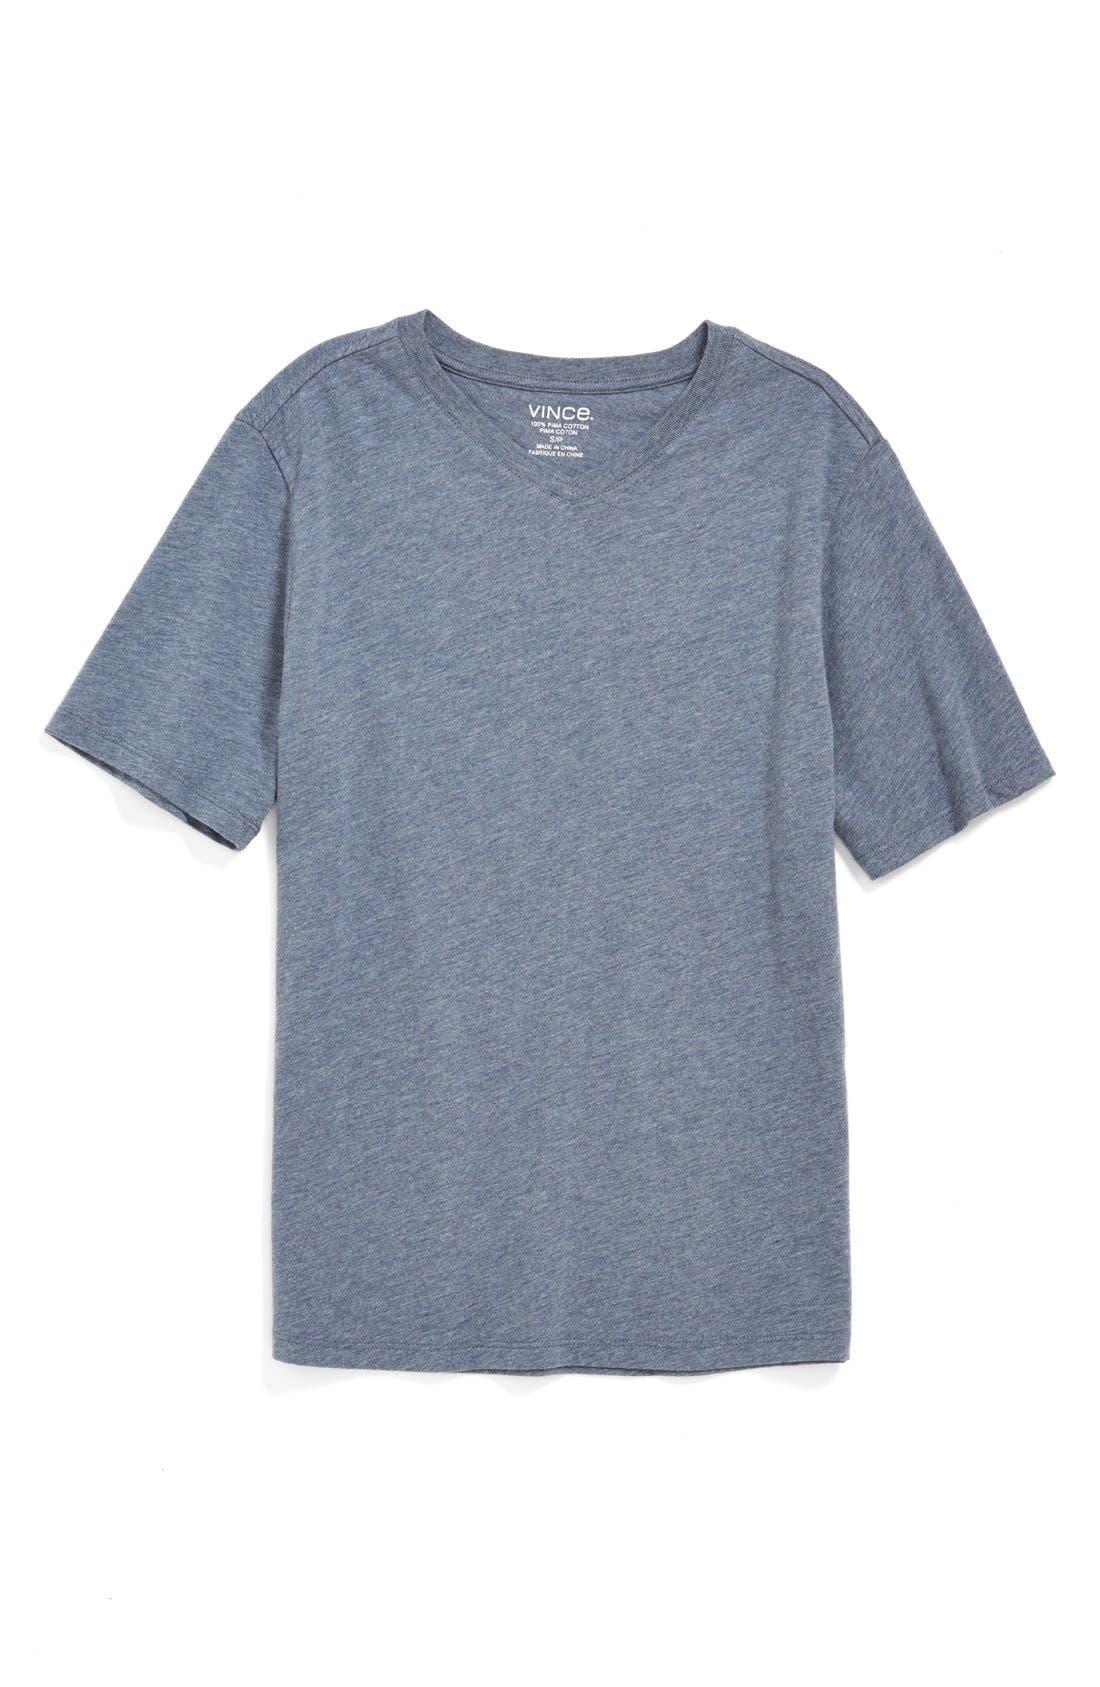 Alternate Image 1 Selected - Vince 'Favorite' V-Neck T-Shirt (Little Boys)